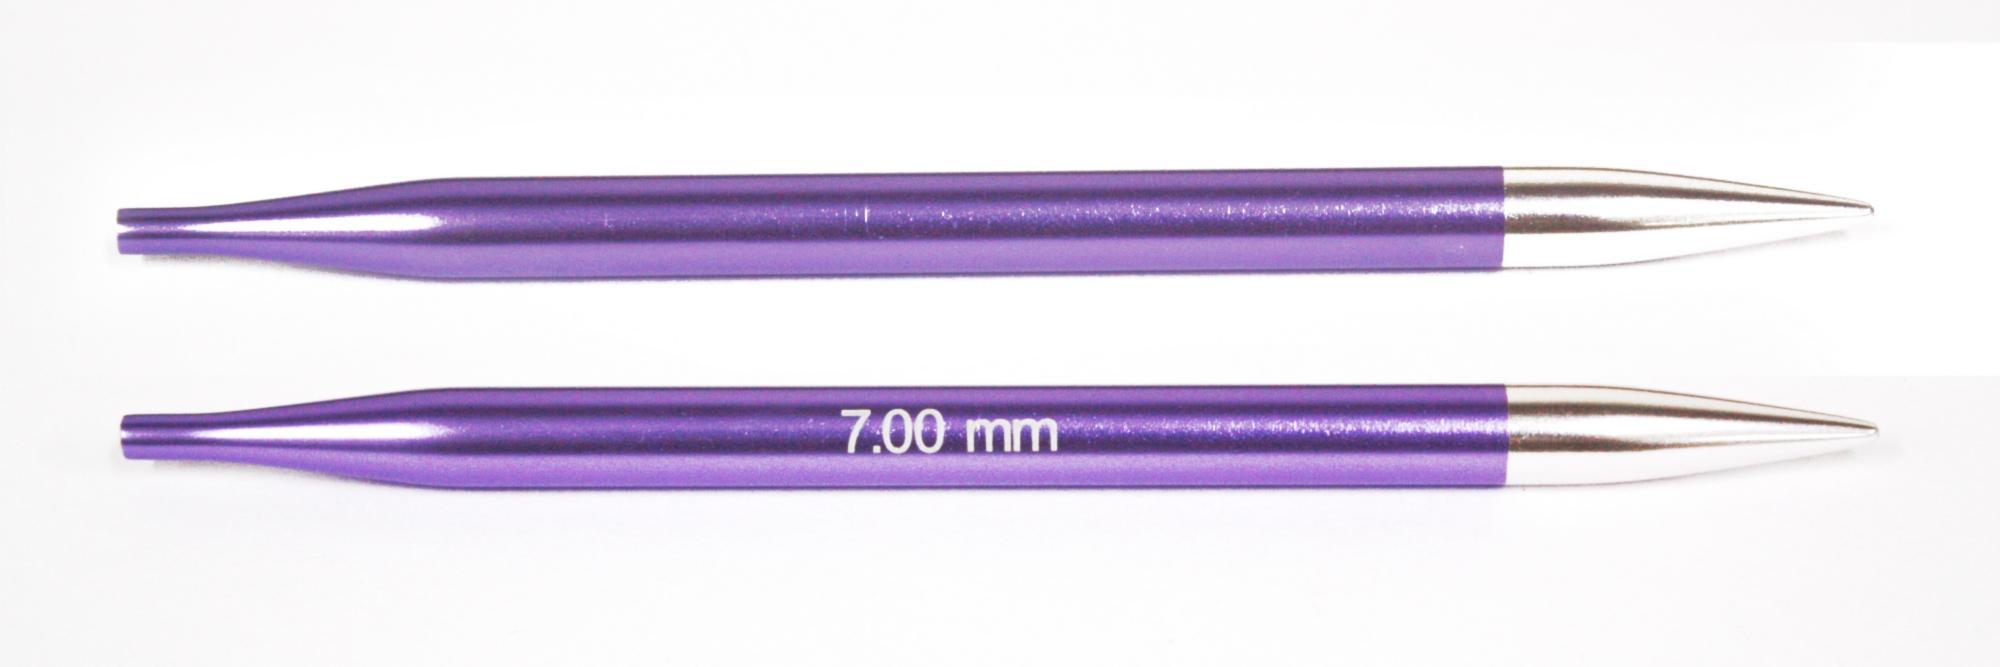 Спицы съемные Zing KnitPro, 47509, 7.00 мм